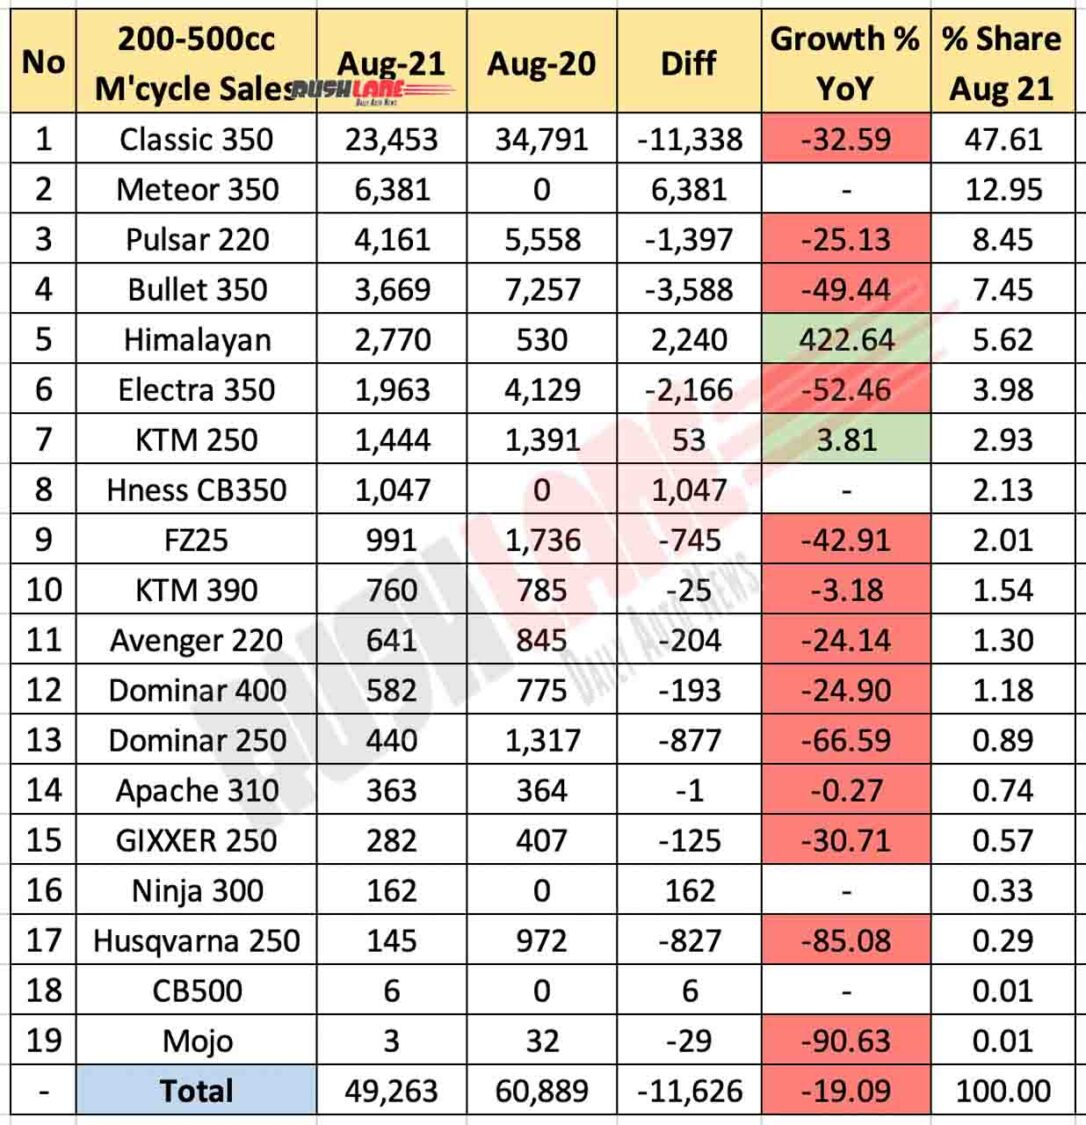 Motorcycle Sales 200cc To 500cc Segment - Aug 2021 vs Aug 2020 (YoY)